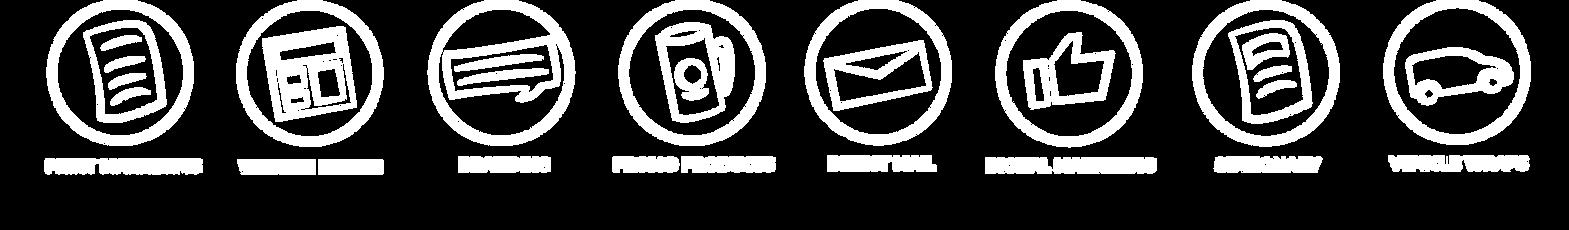 marketing services, marketing company, marketing agency, advertising agency, creative agency, graphic design, marketing, advertising, nwa, northwest arkansas